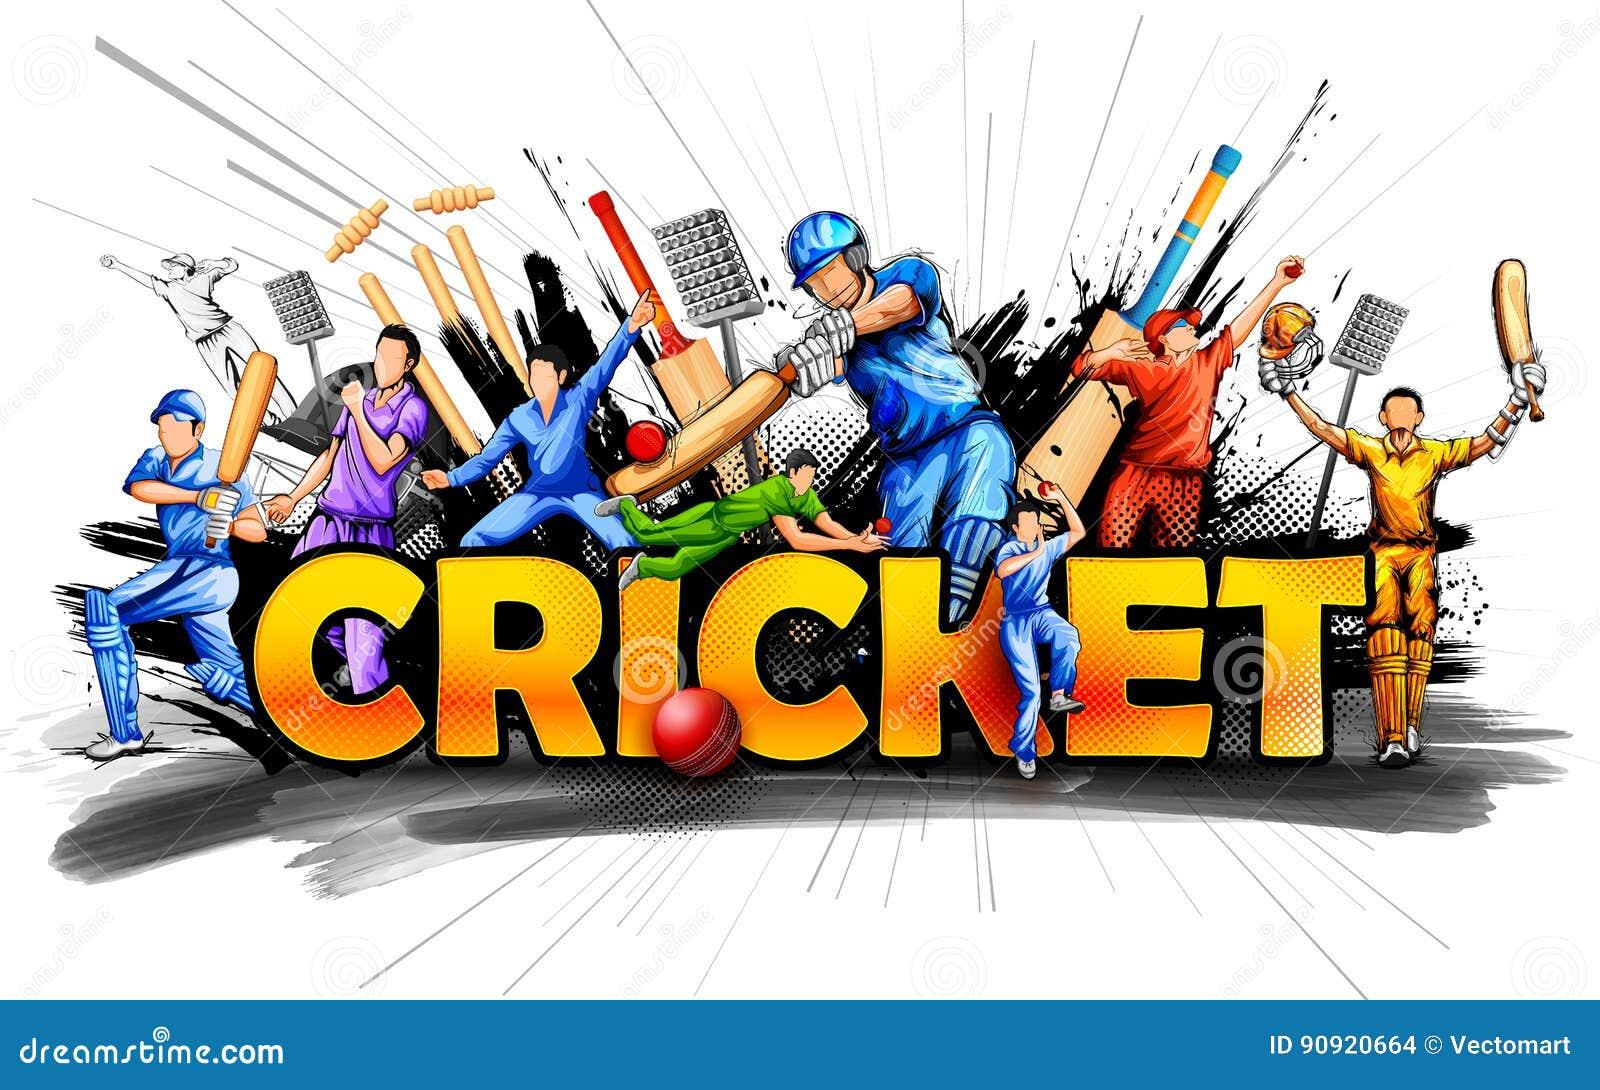 Cricket Vector Background Stock Image: Batsman And Bowler Playing Cricket Championship Sports